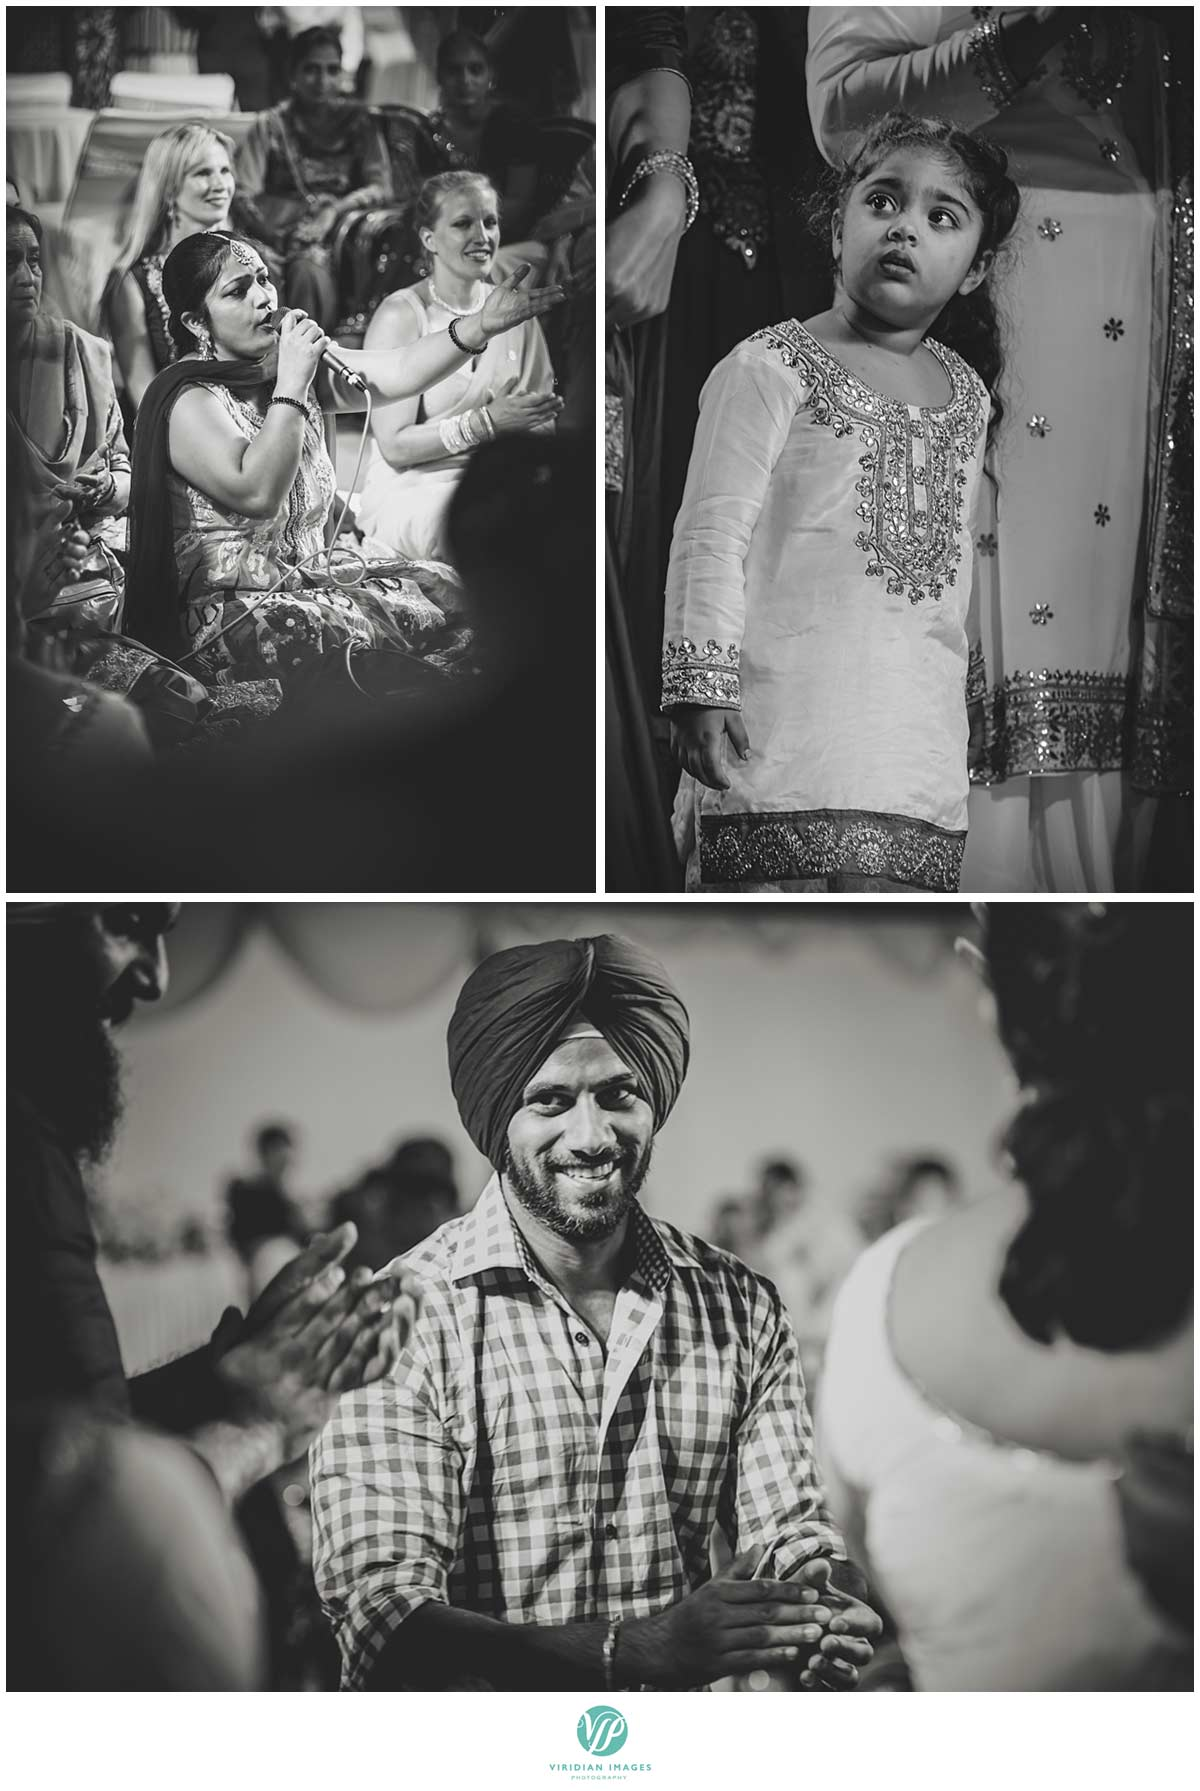 India_Chandigarh_Sangeet_Viridian_Images_Photography_poto_3